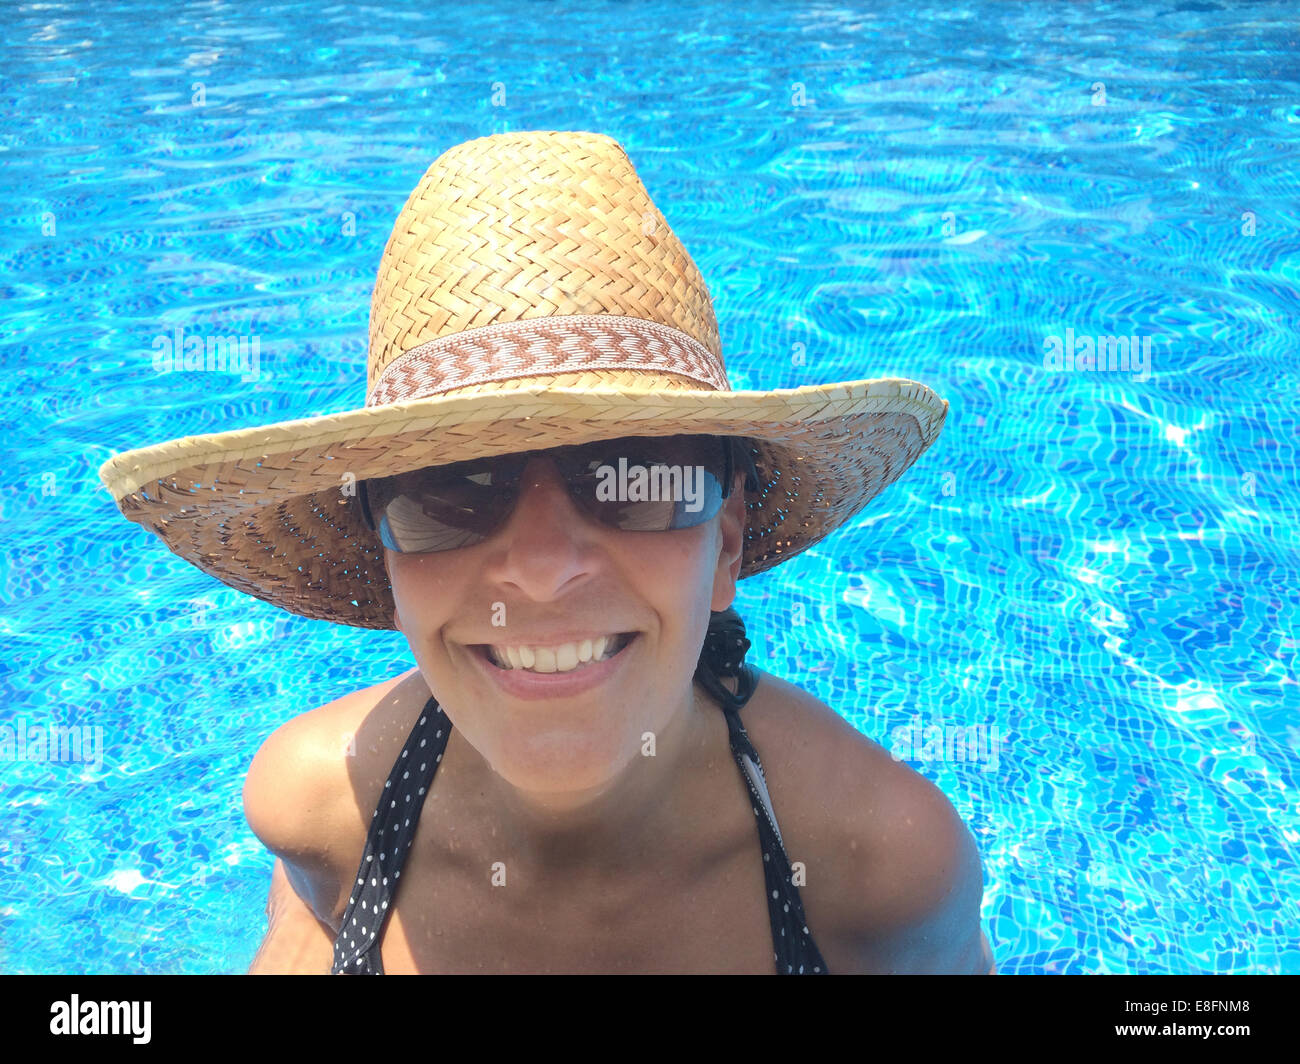 Smiling woman in swimming pool - Stock Image